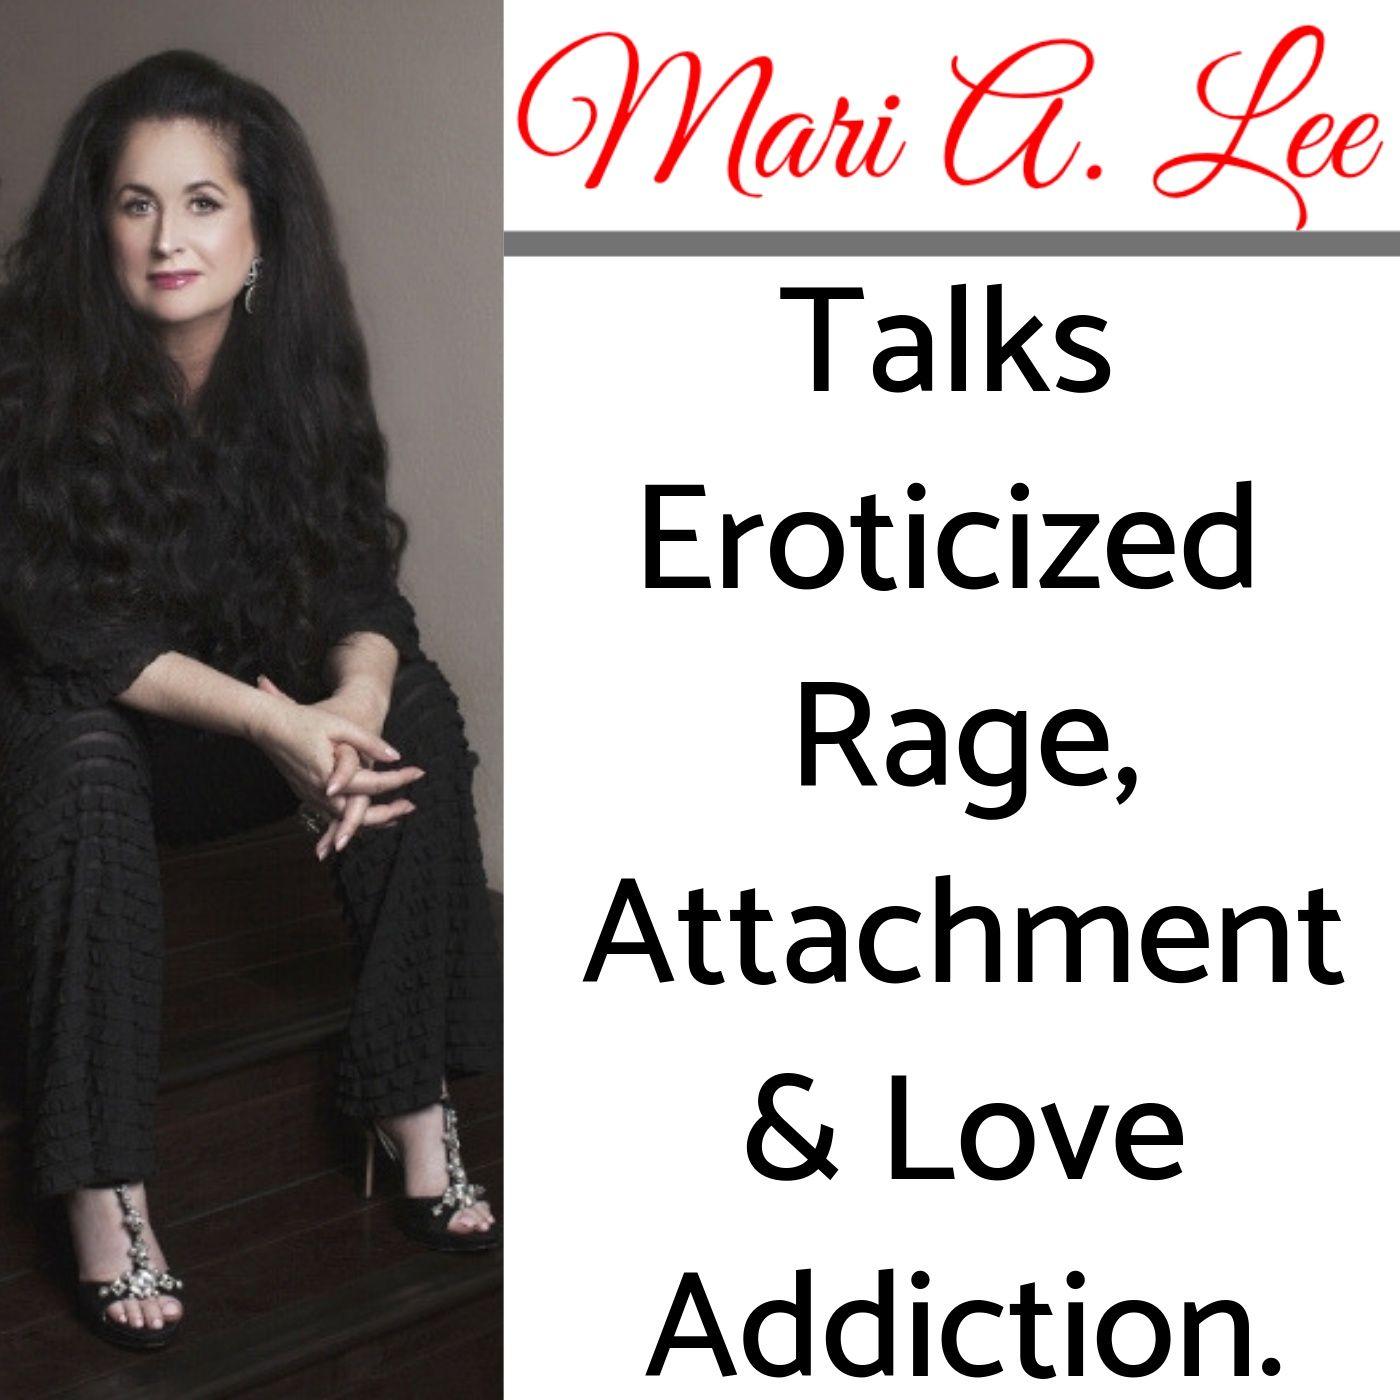 Part 5 of 5: Mari A. Lee, LMFT, CSAT-S Talks Eroticized Rage, Attachment & Love Addiction.